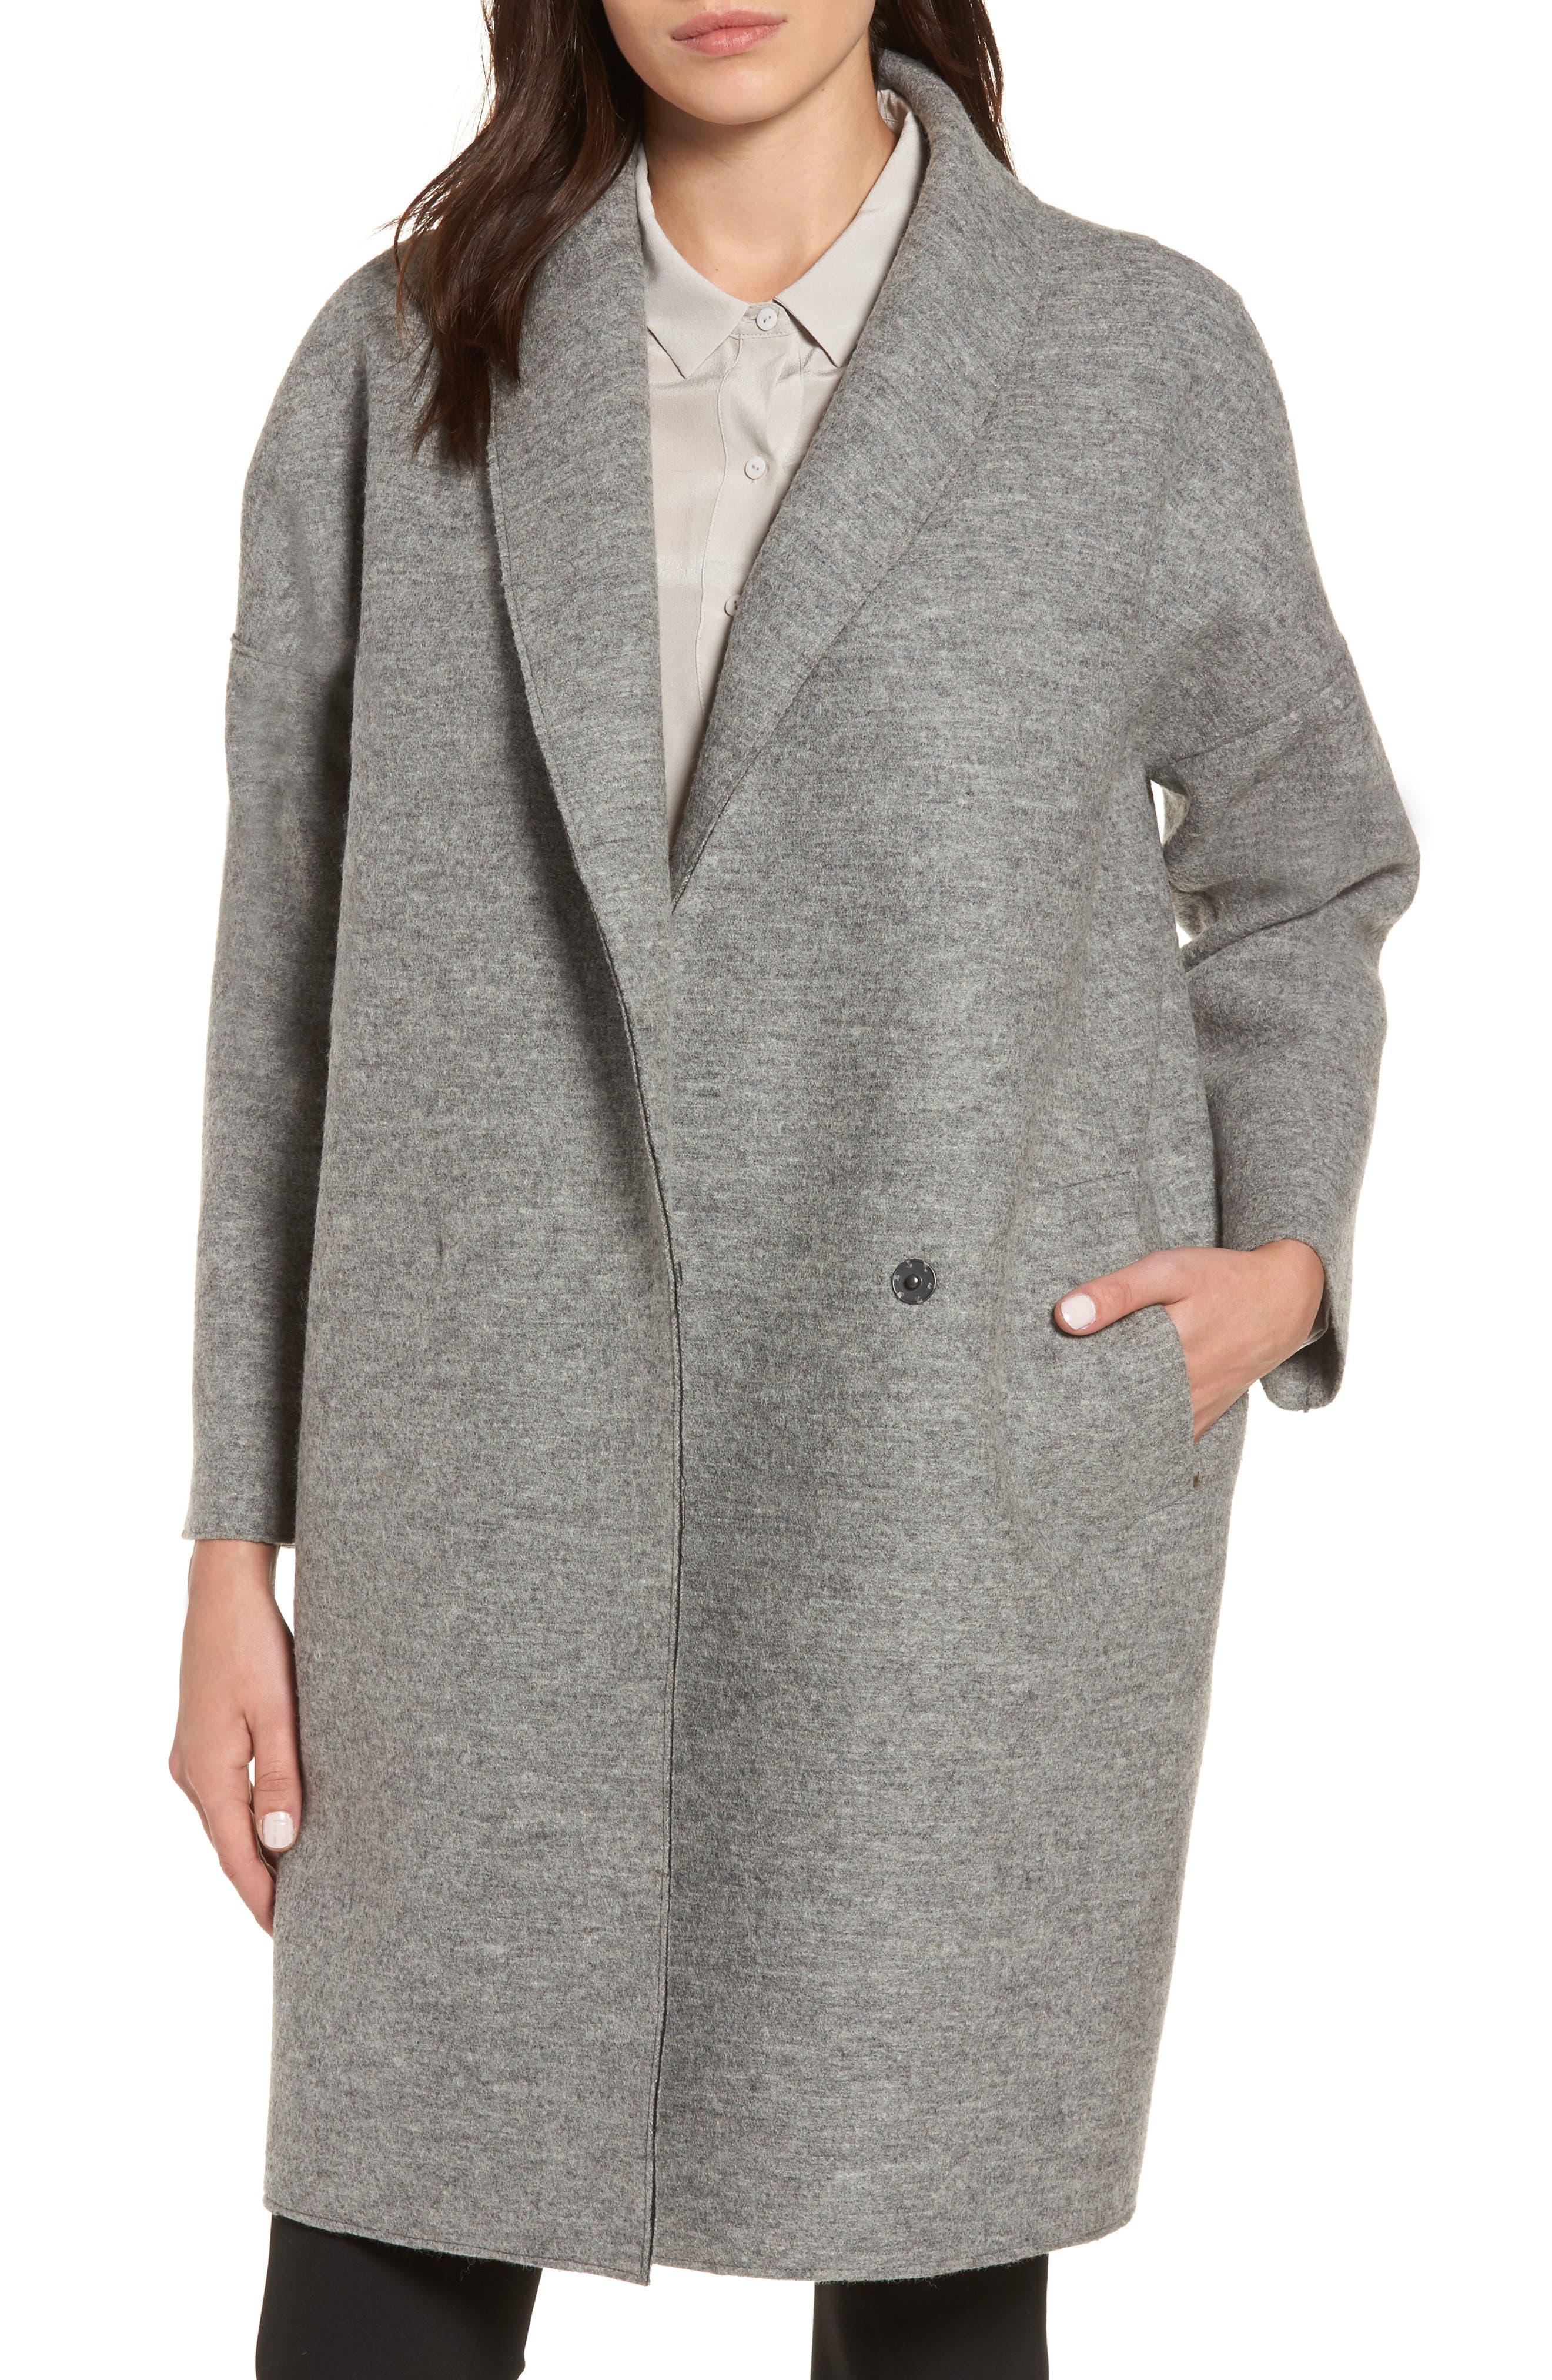 Emma Boiled Wool Coat,                             Main thumbnail 1, color,                             020